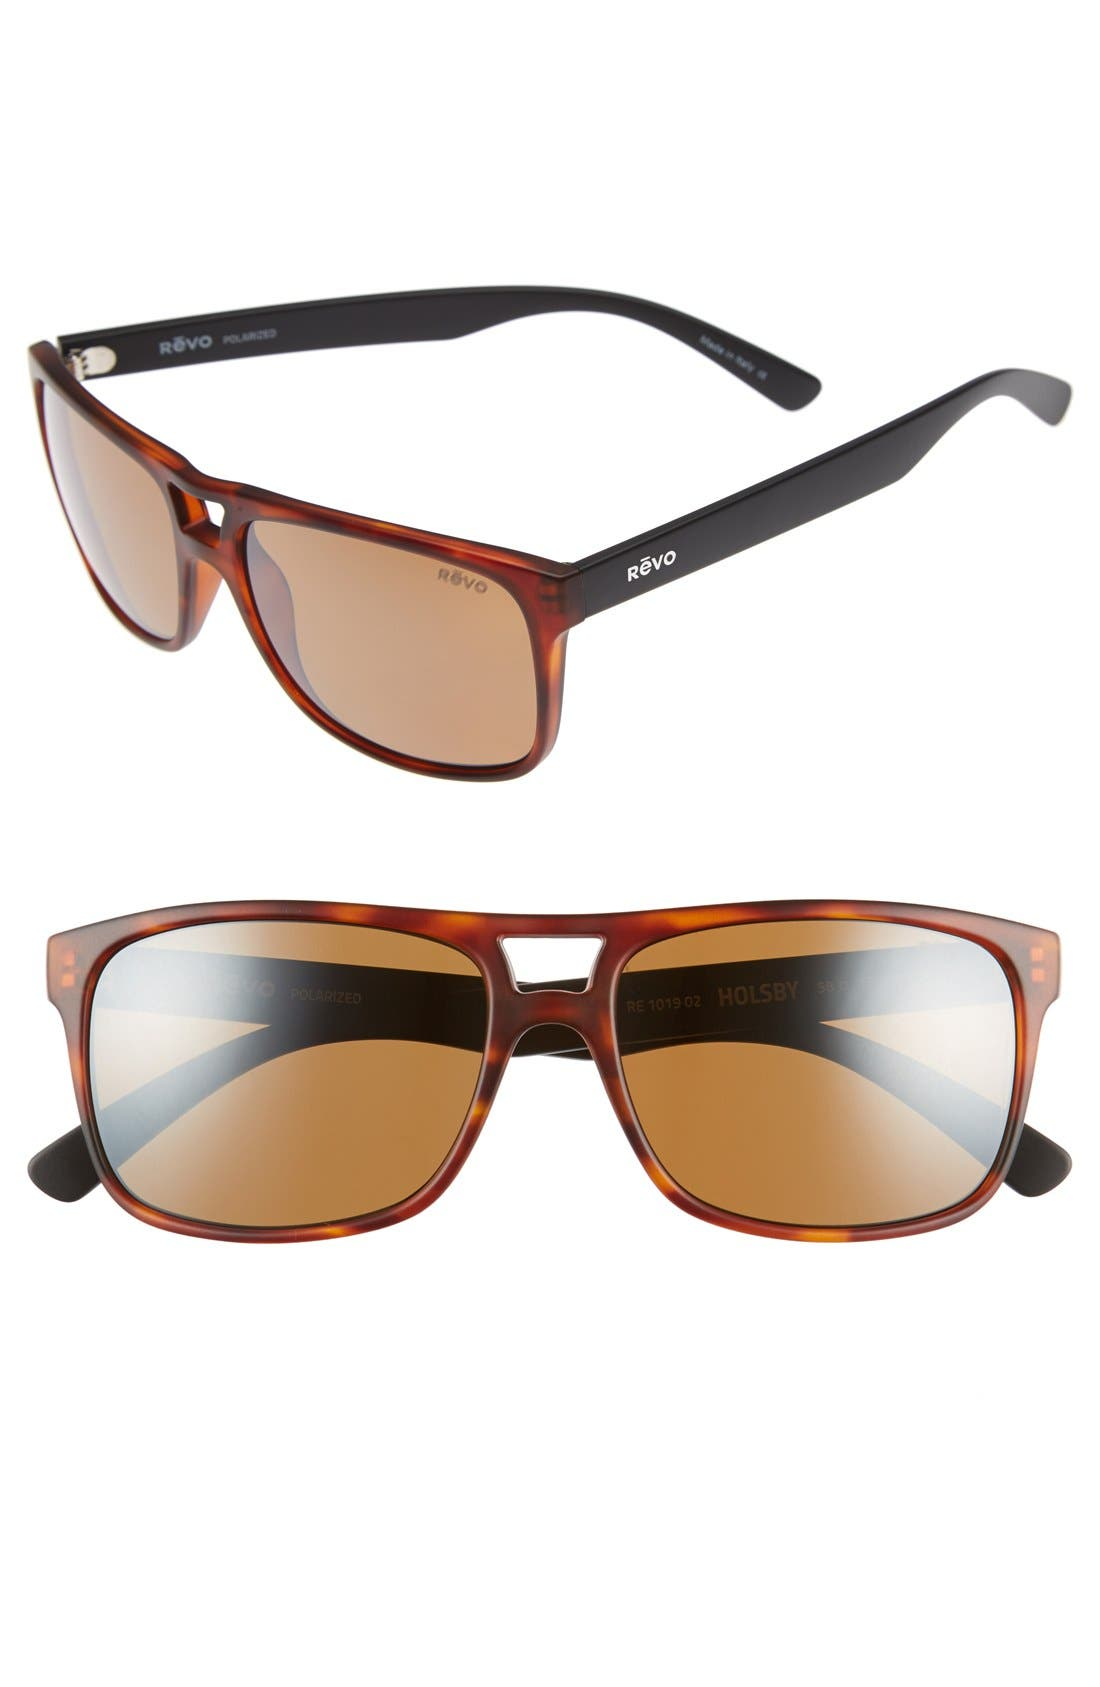 REVO 'Holsby' 58mm Polarized Sunglasses